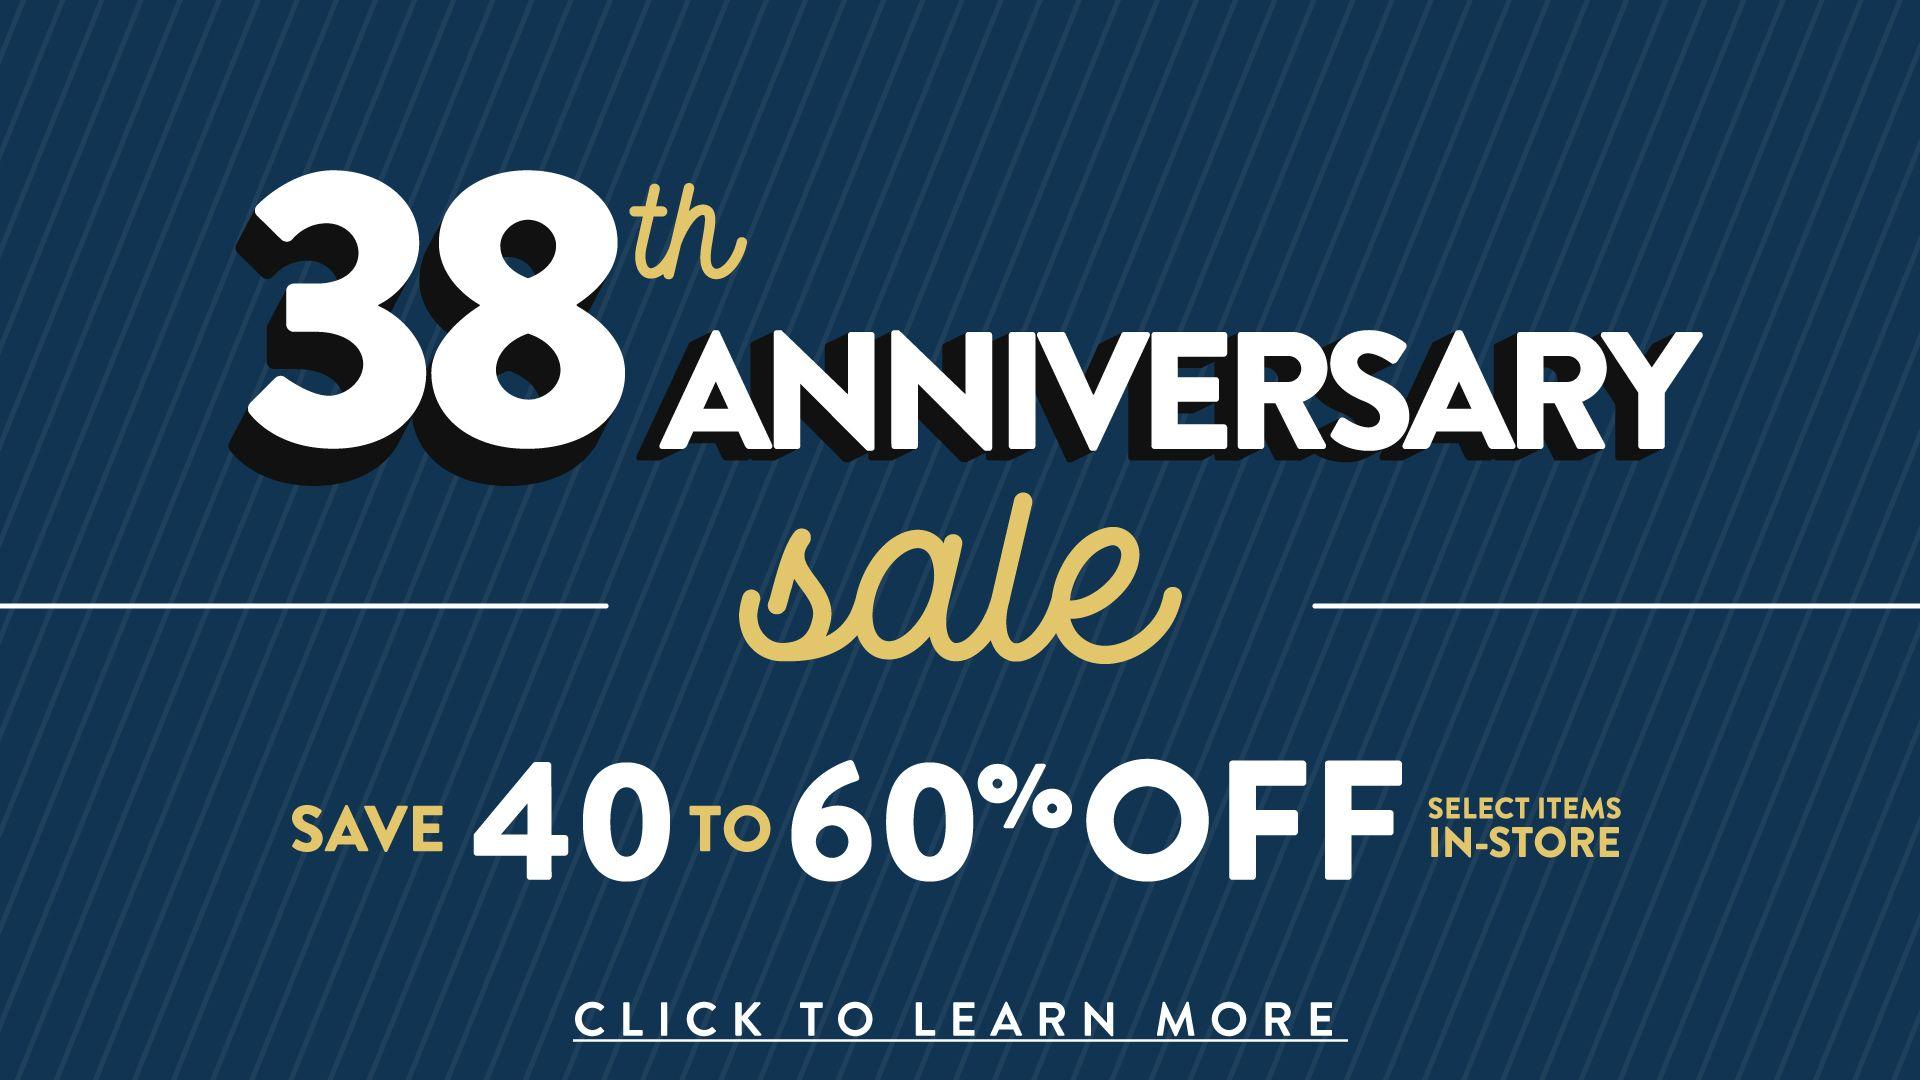 38th Anniversary Sale